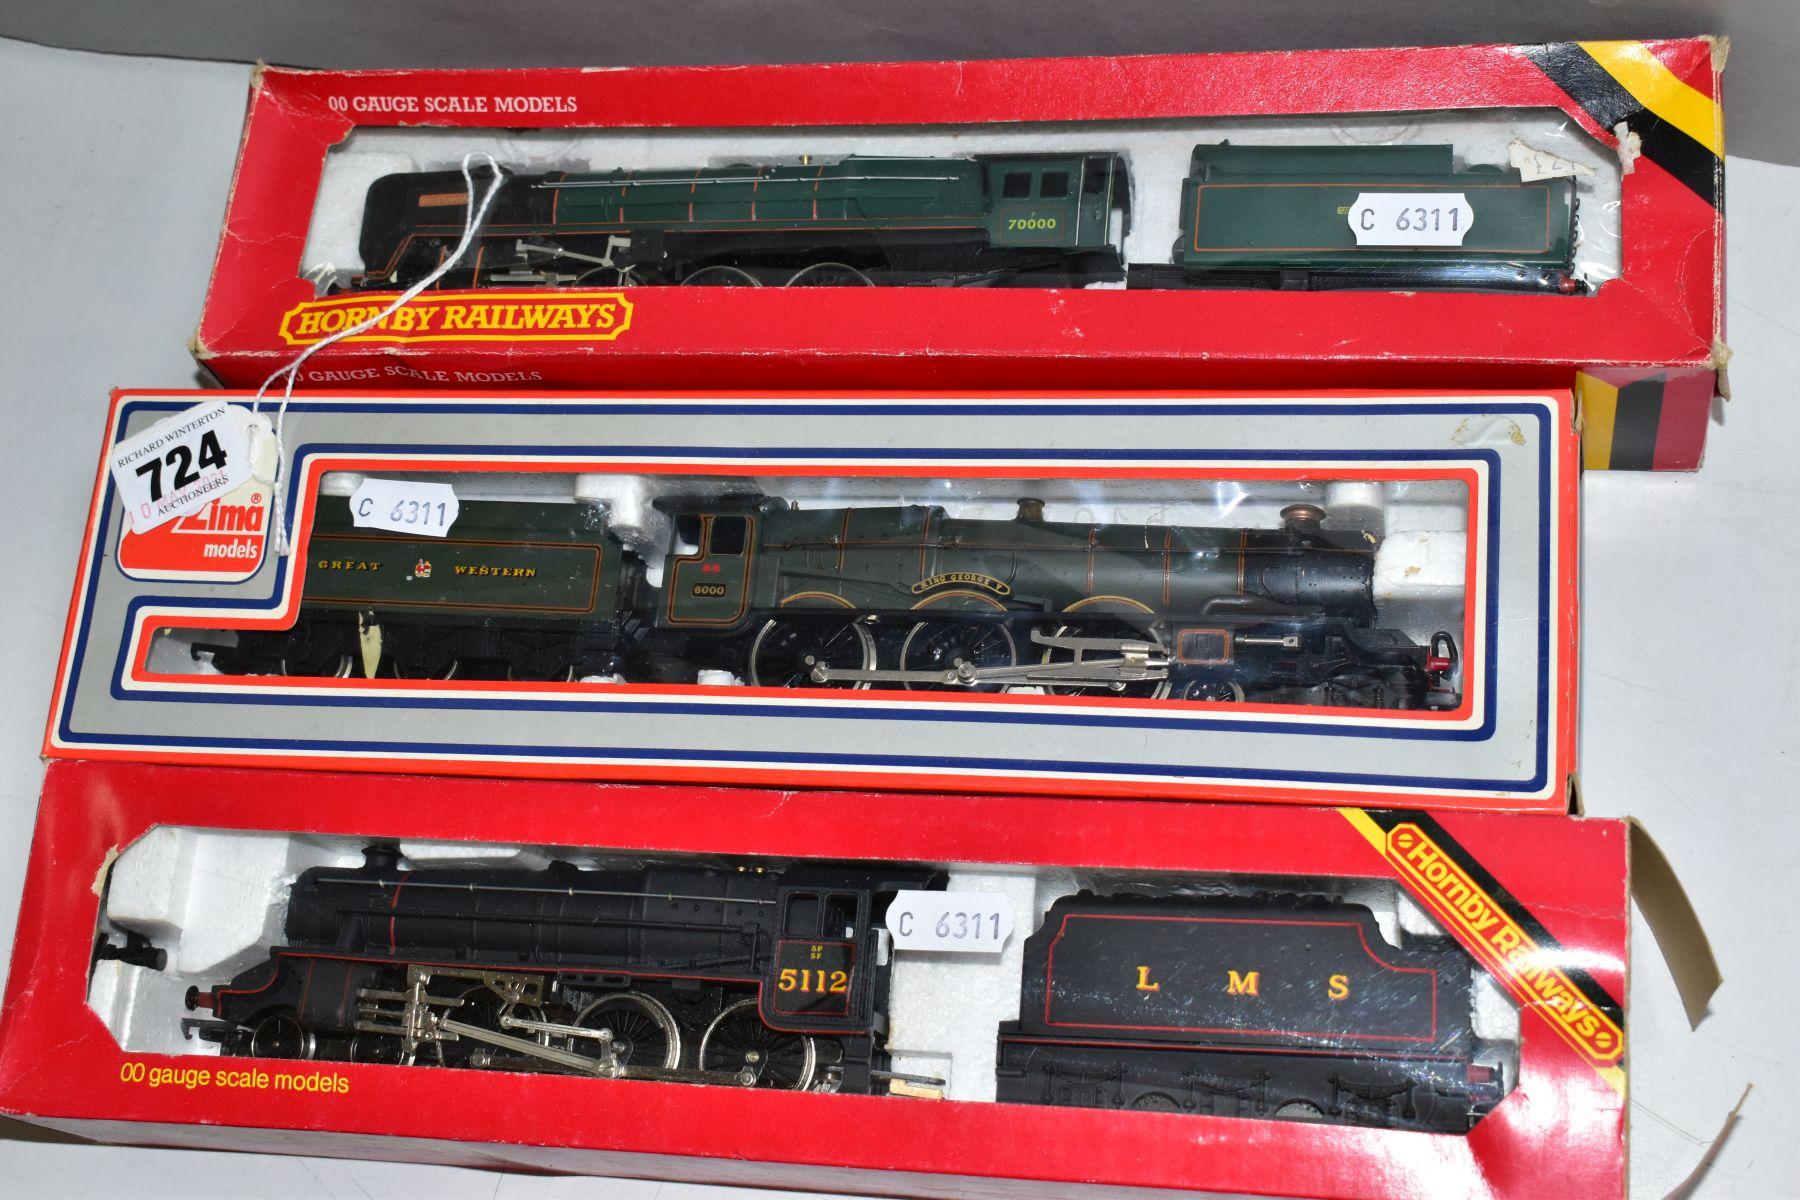 THREE BOXED 00 GAUGE MODEL RAILWAY LOCOMOTIVES, Hornby Britannia Class 'Britanna' No. 70000, B.R. - Image 3 of 3